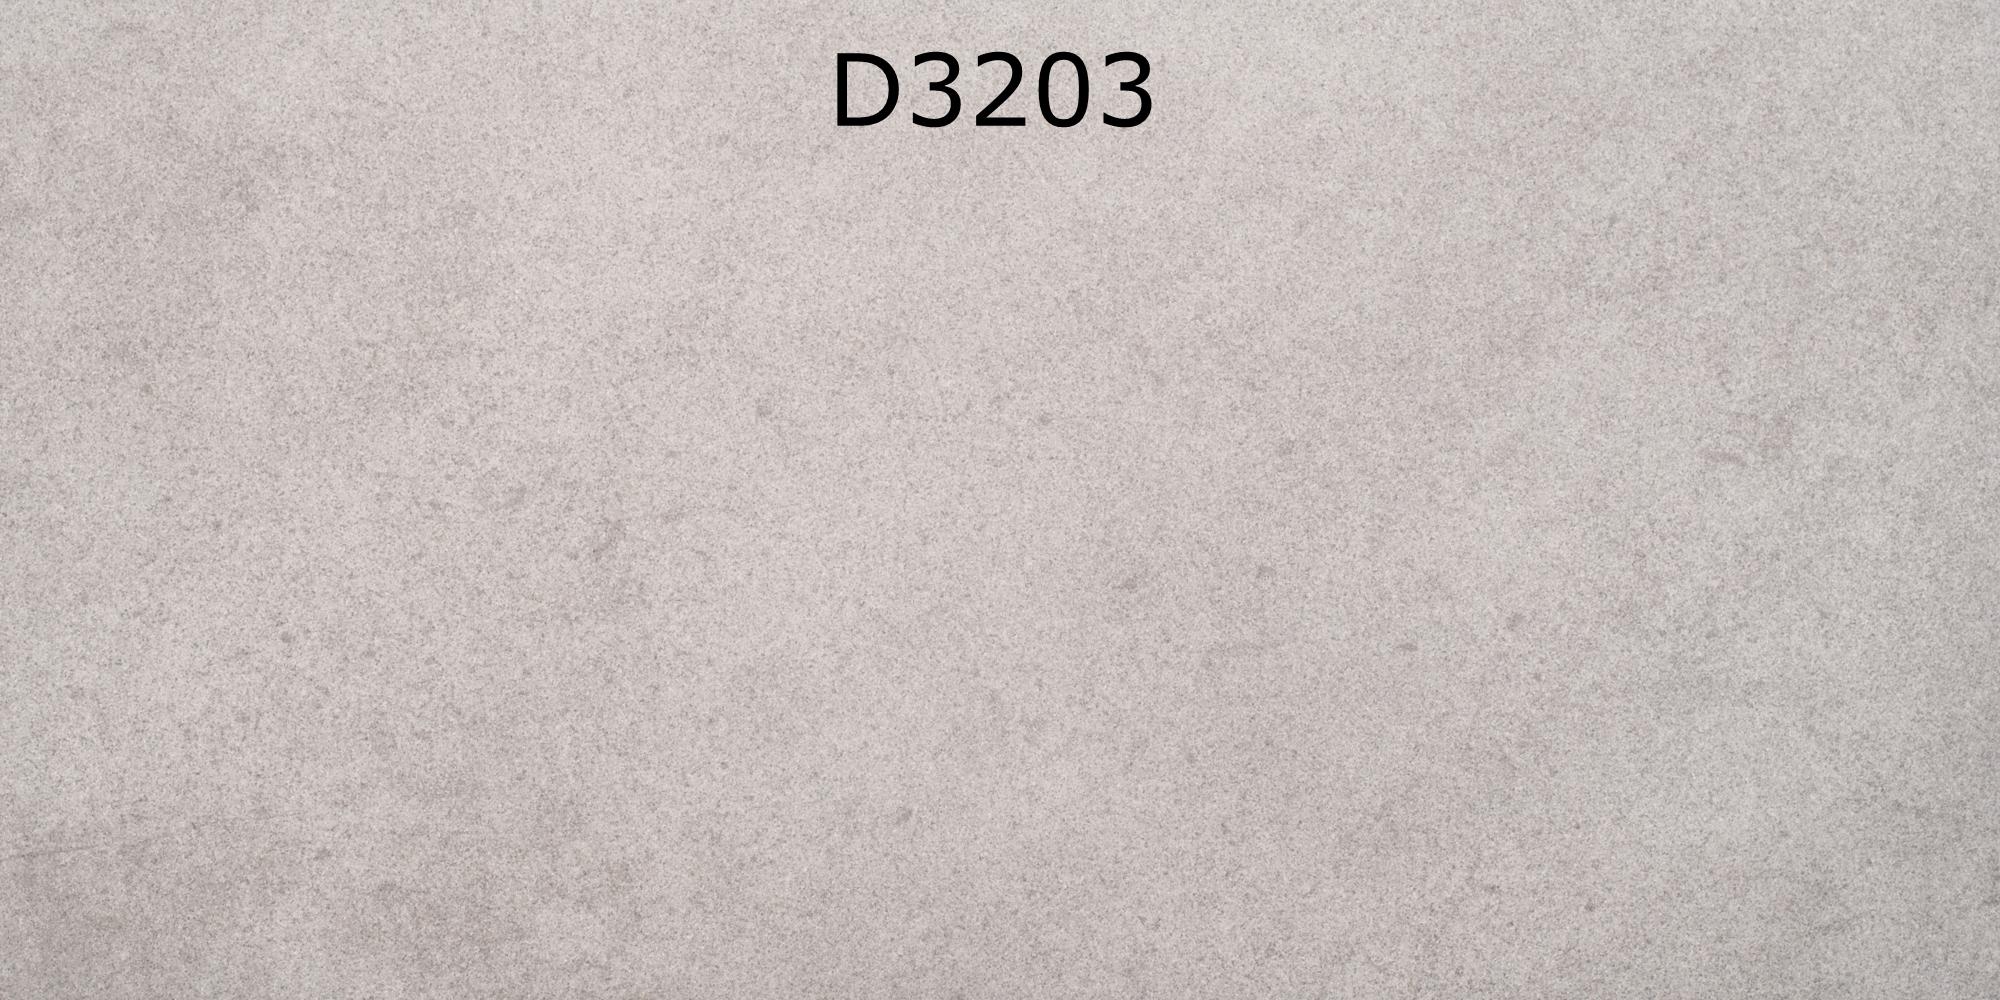 D3203